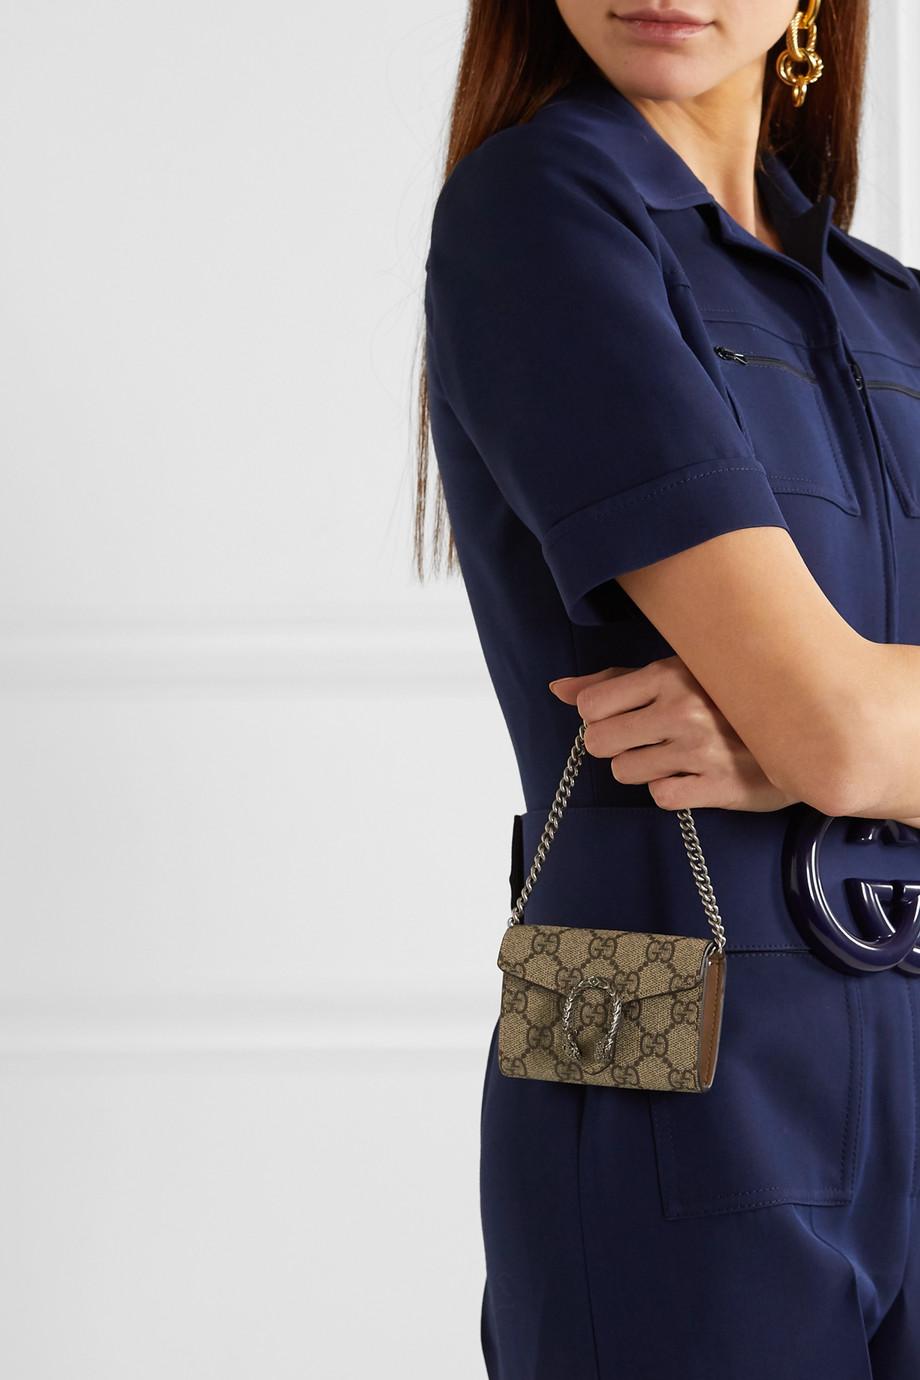 Gucci Dionysus 印花涂层帆布皮革超迷你单肩包